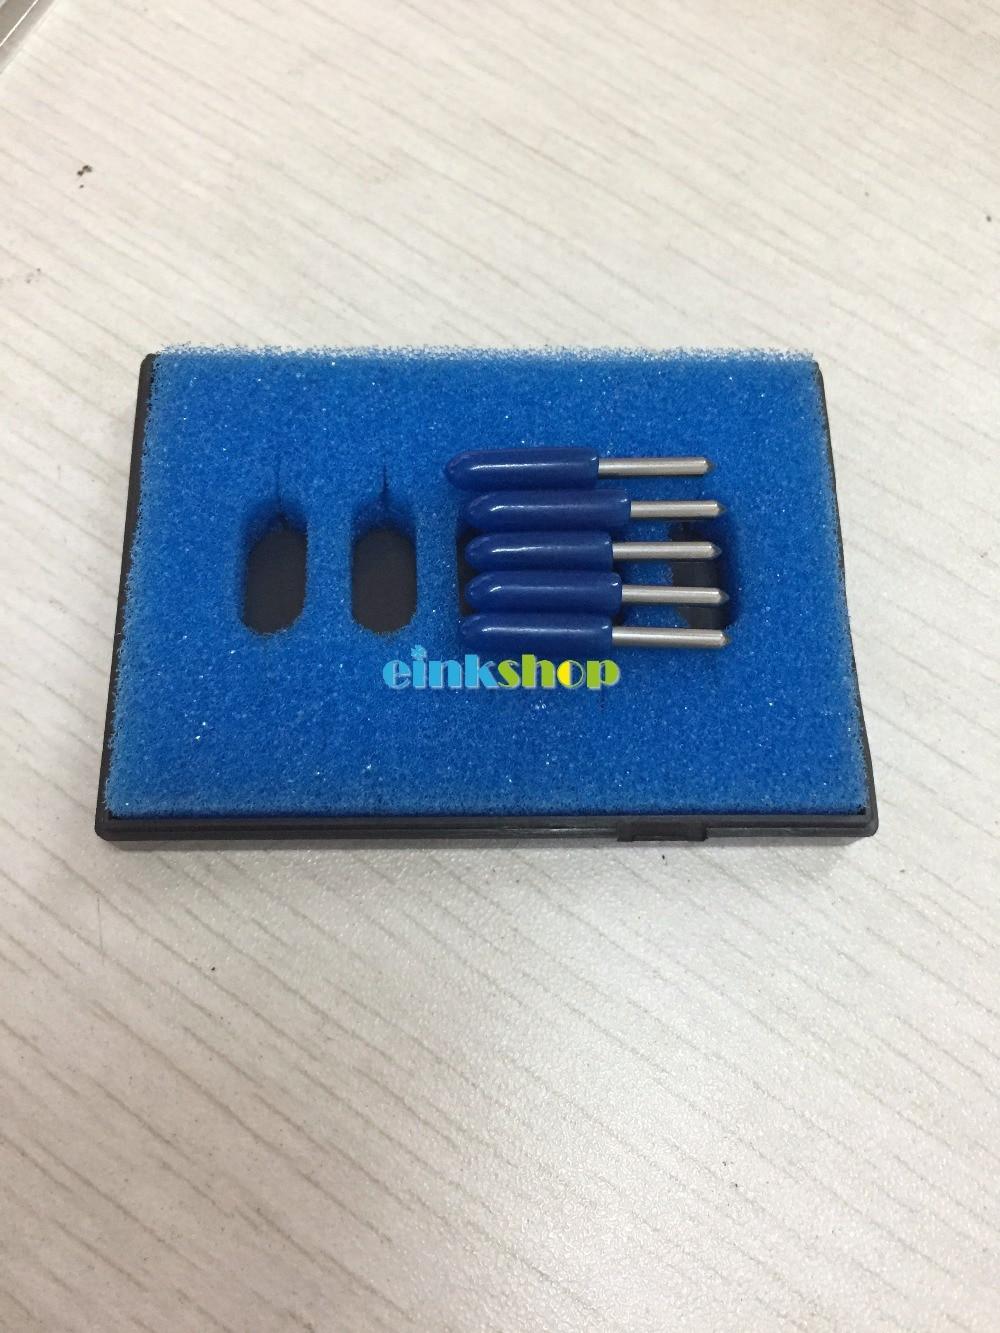 45 einkshop Novo Para roland cortador vinil plotter blades graus roland blades plotter de vinil para roland SP/SC/ VP/XC Series